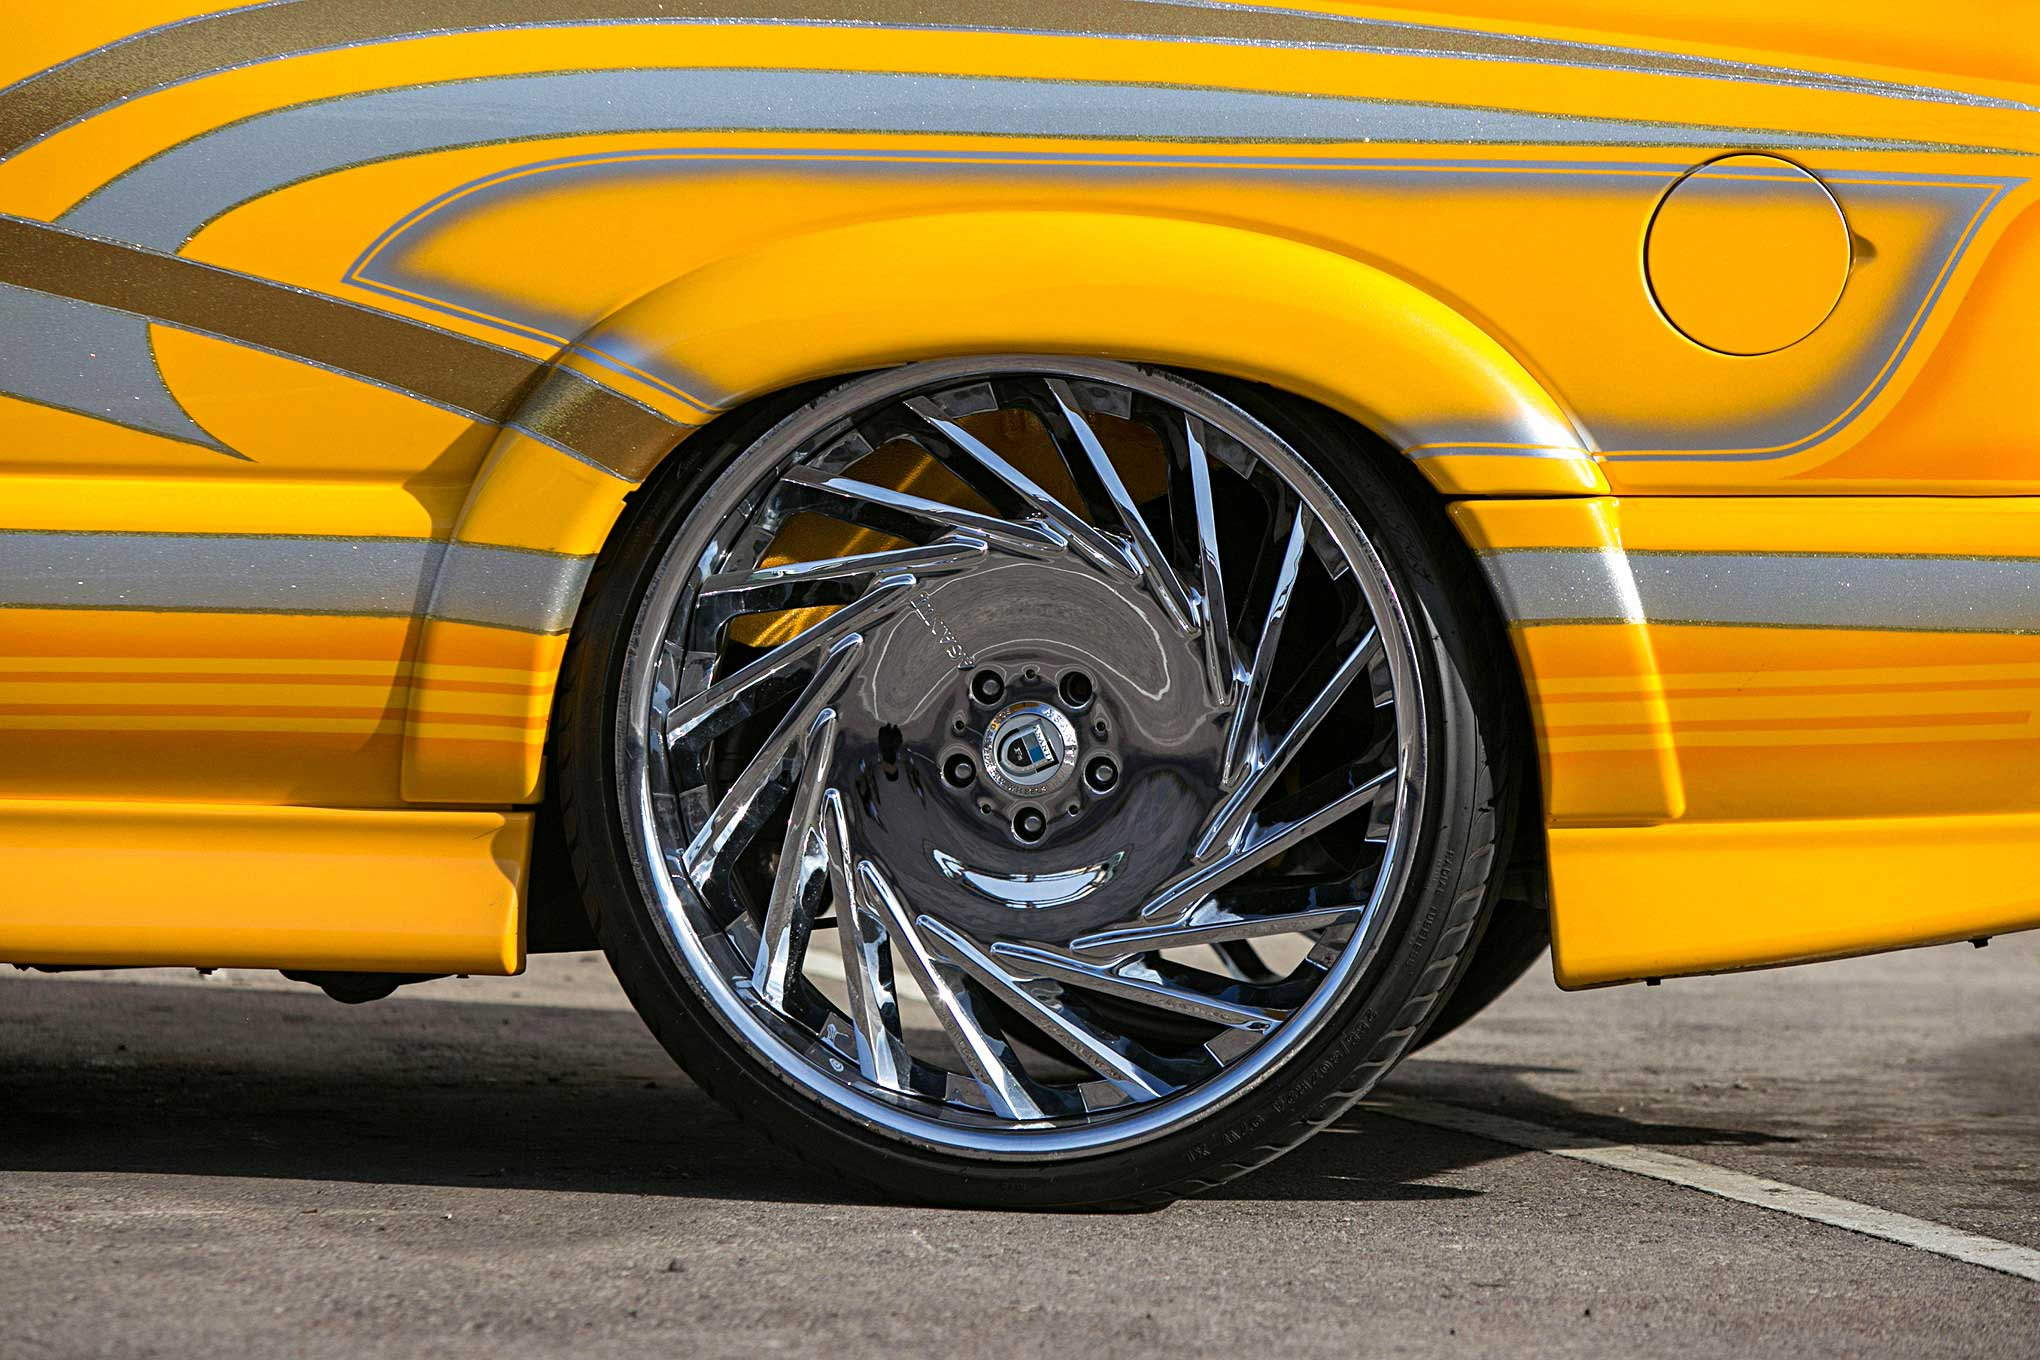 2003 Chevy Blazer Xtreme - An Extreme Build